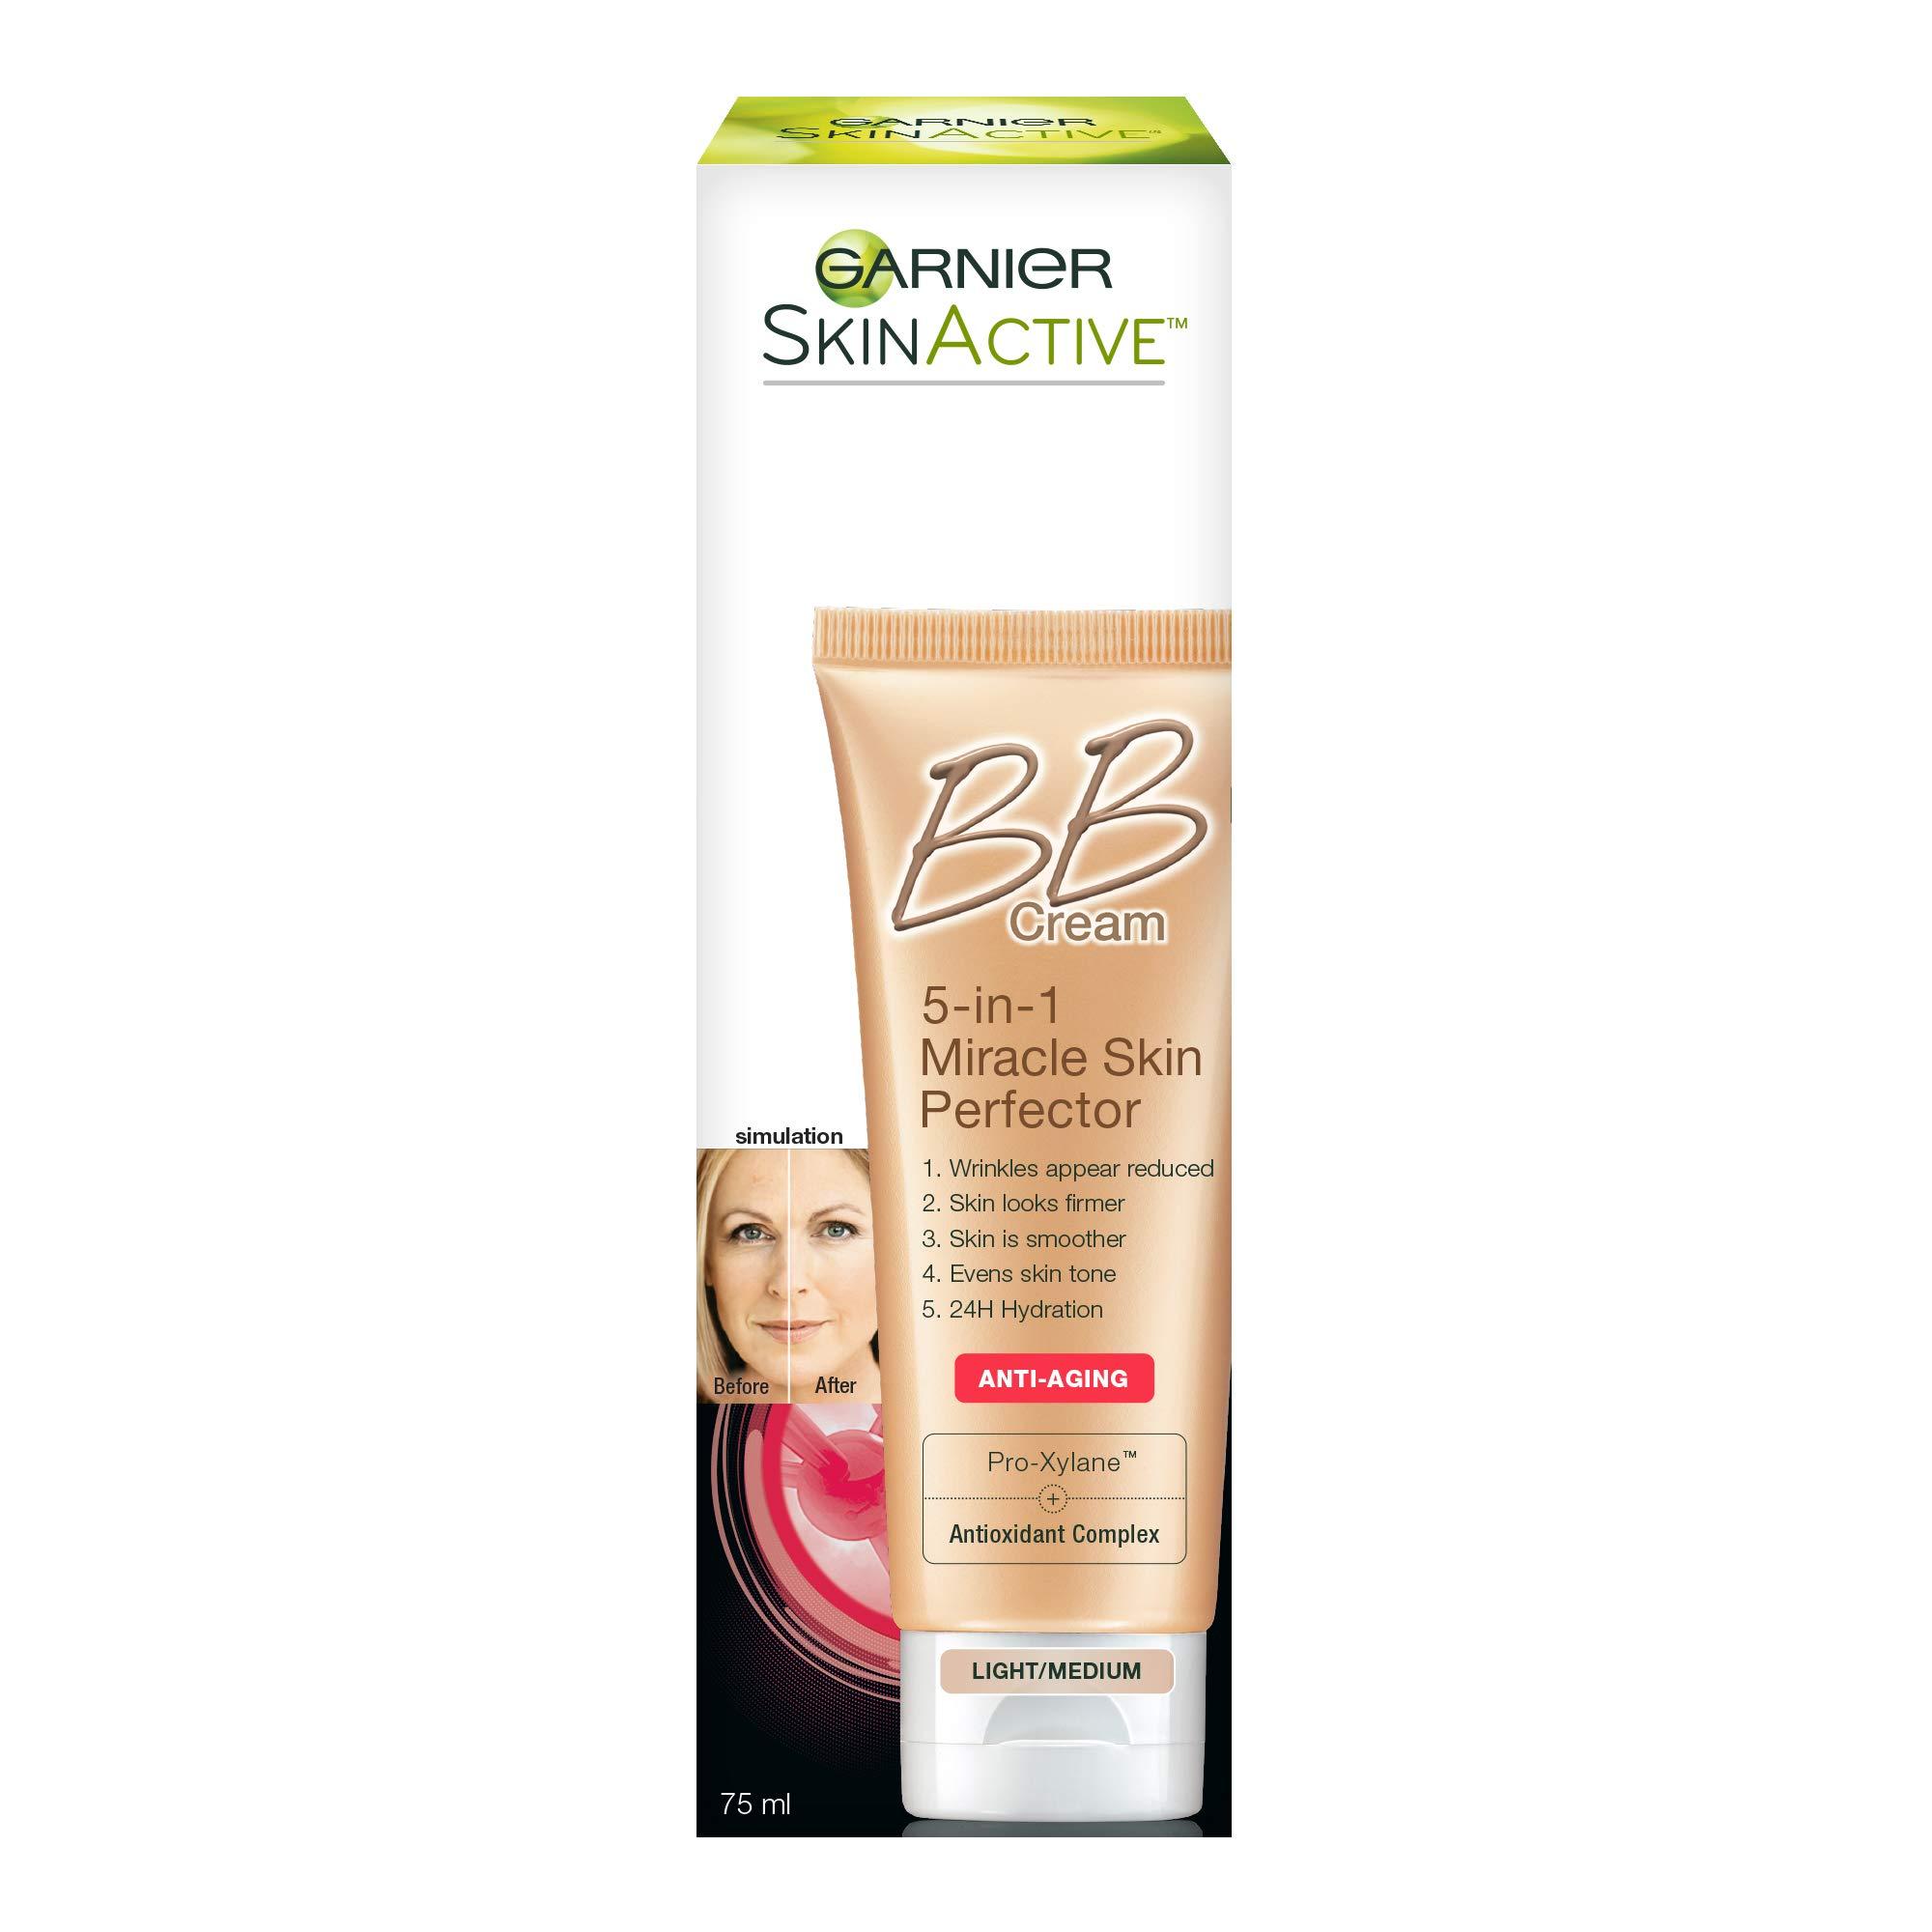 Garnier SkinActive BB Cream Anti-Aging Face Moisturizer..